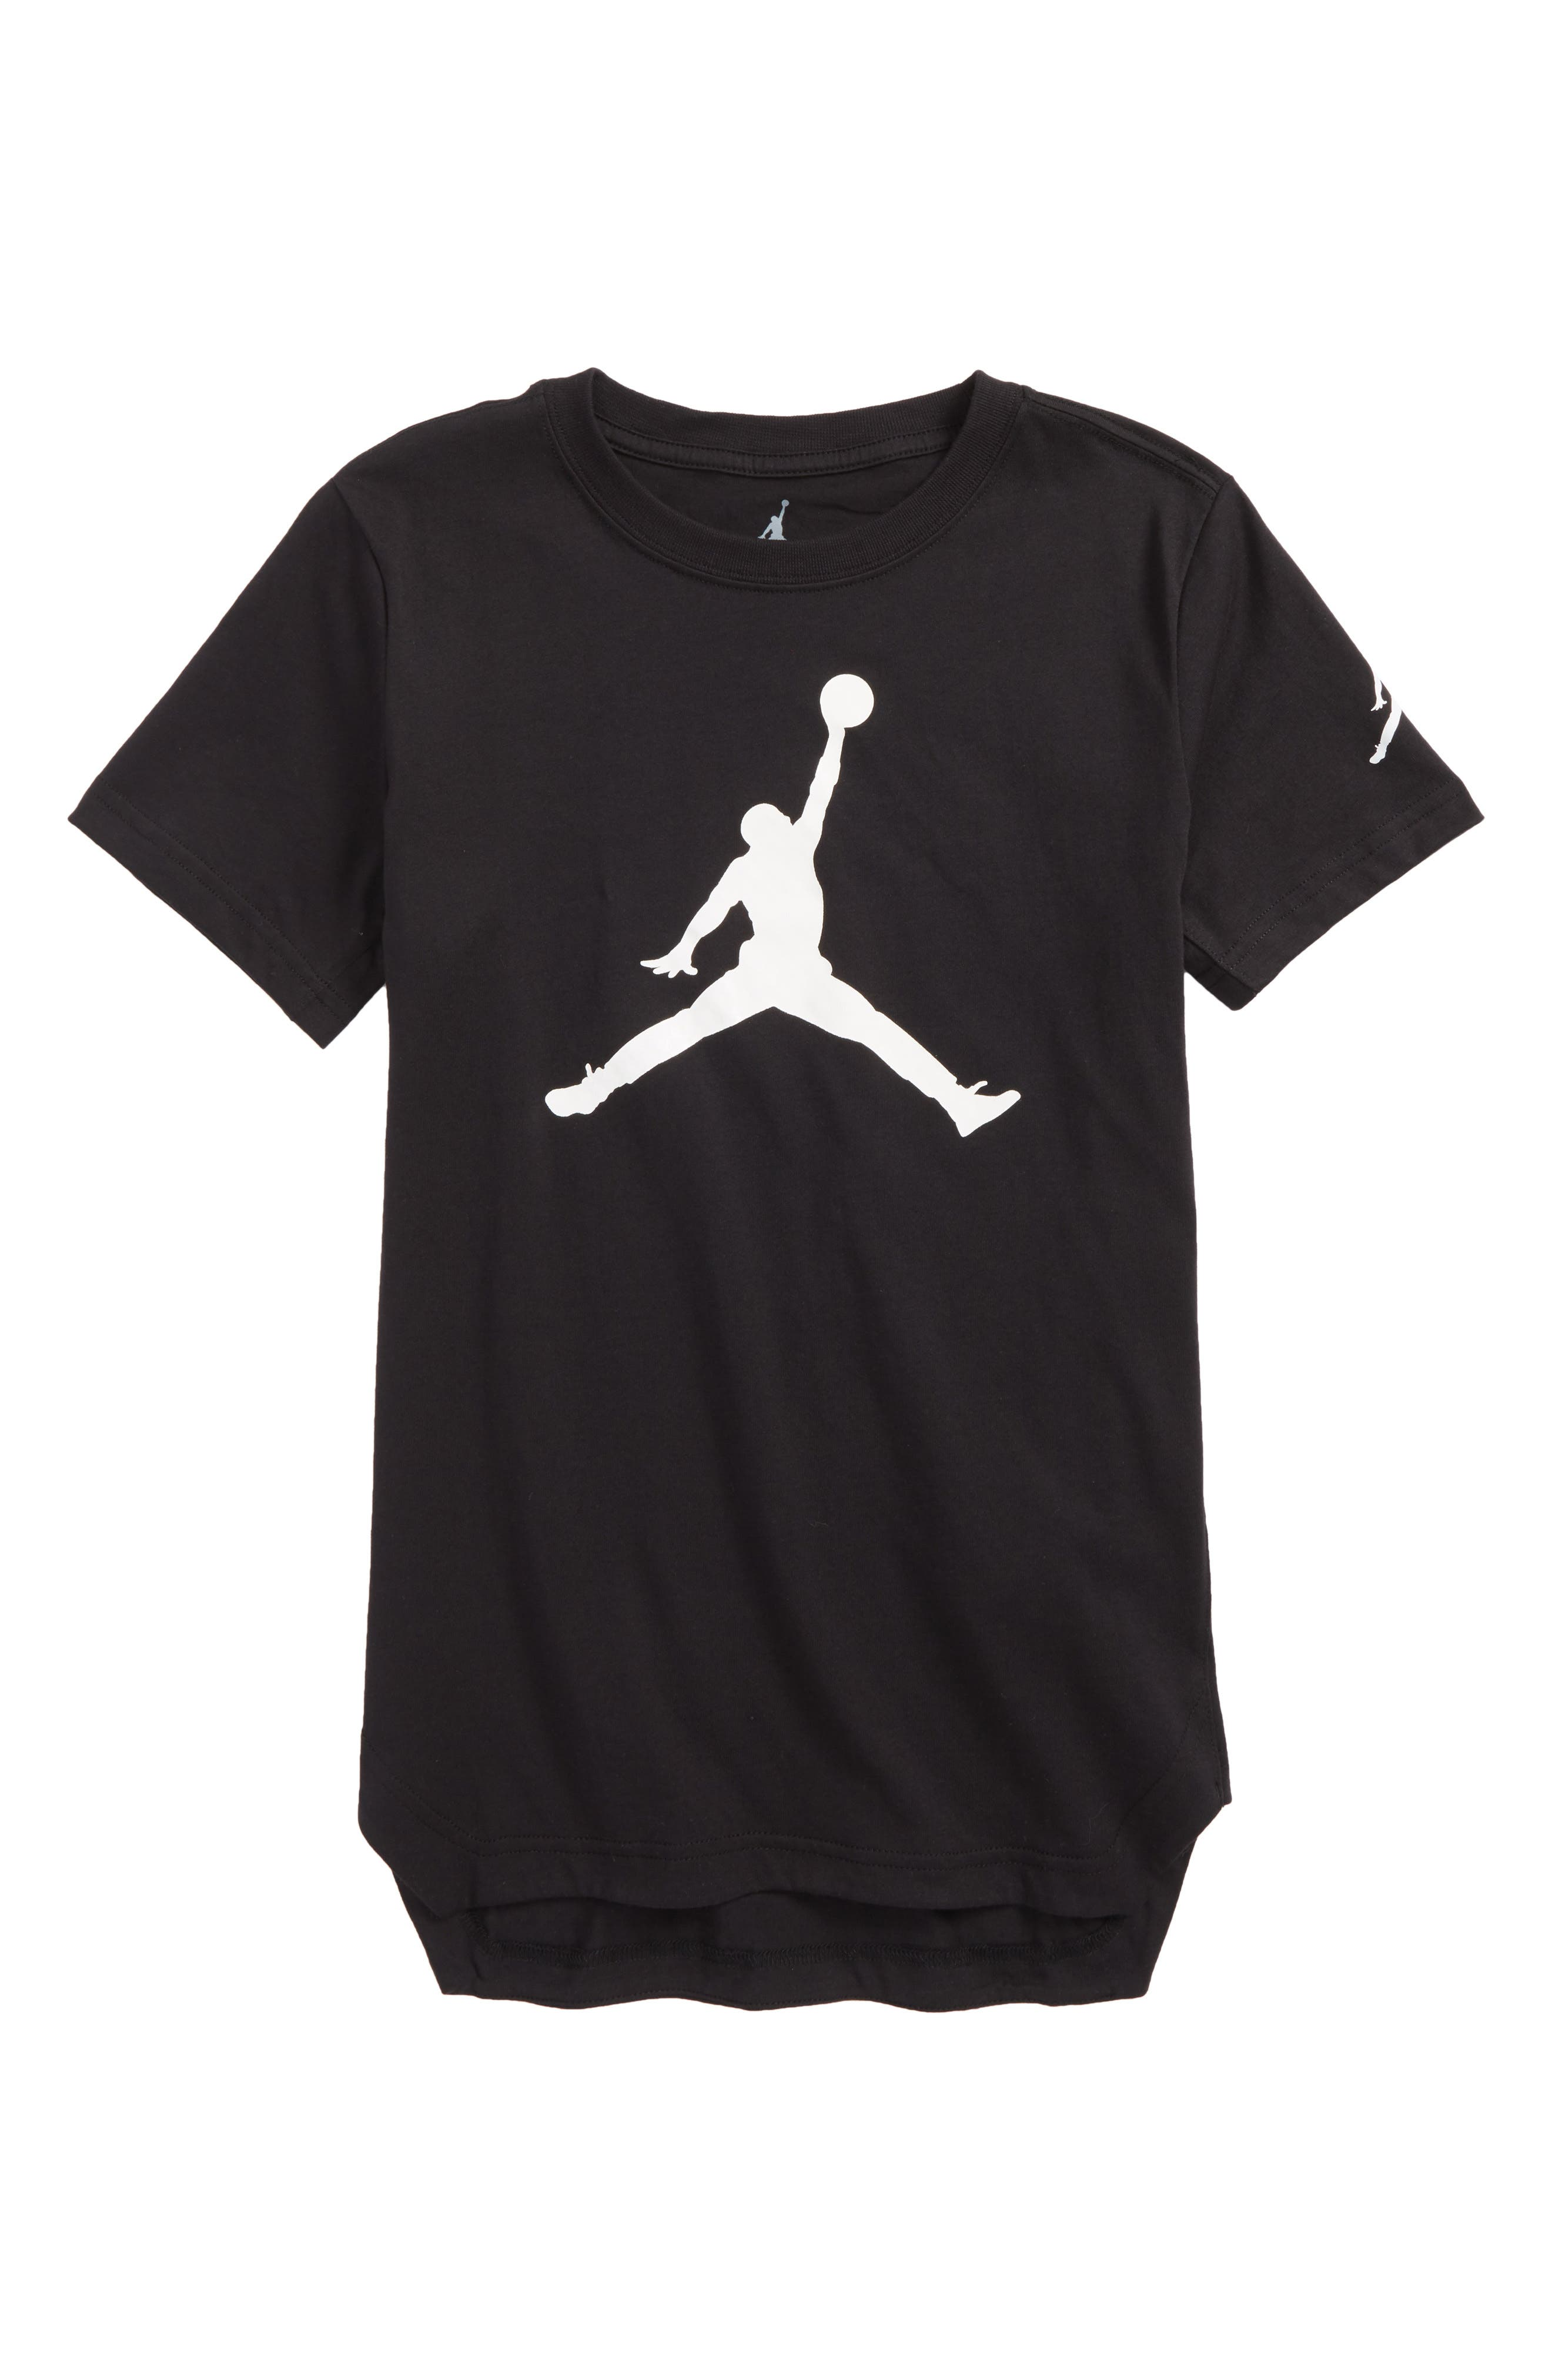 Jordan Jumpman Brand T-Shirt,                         Main,                         color, Black